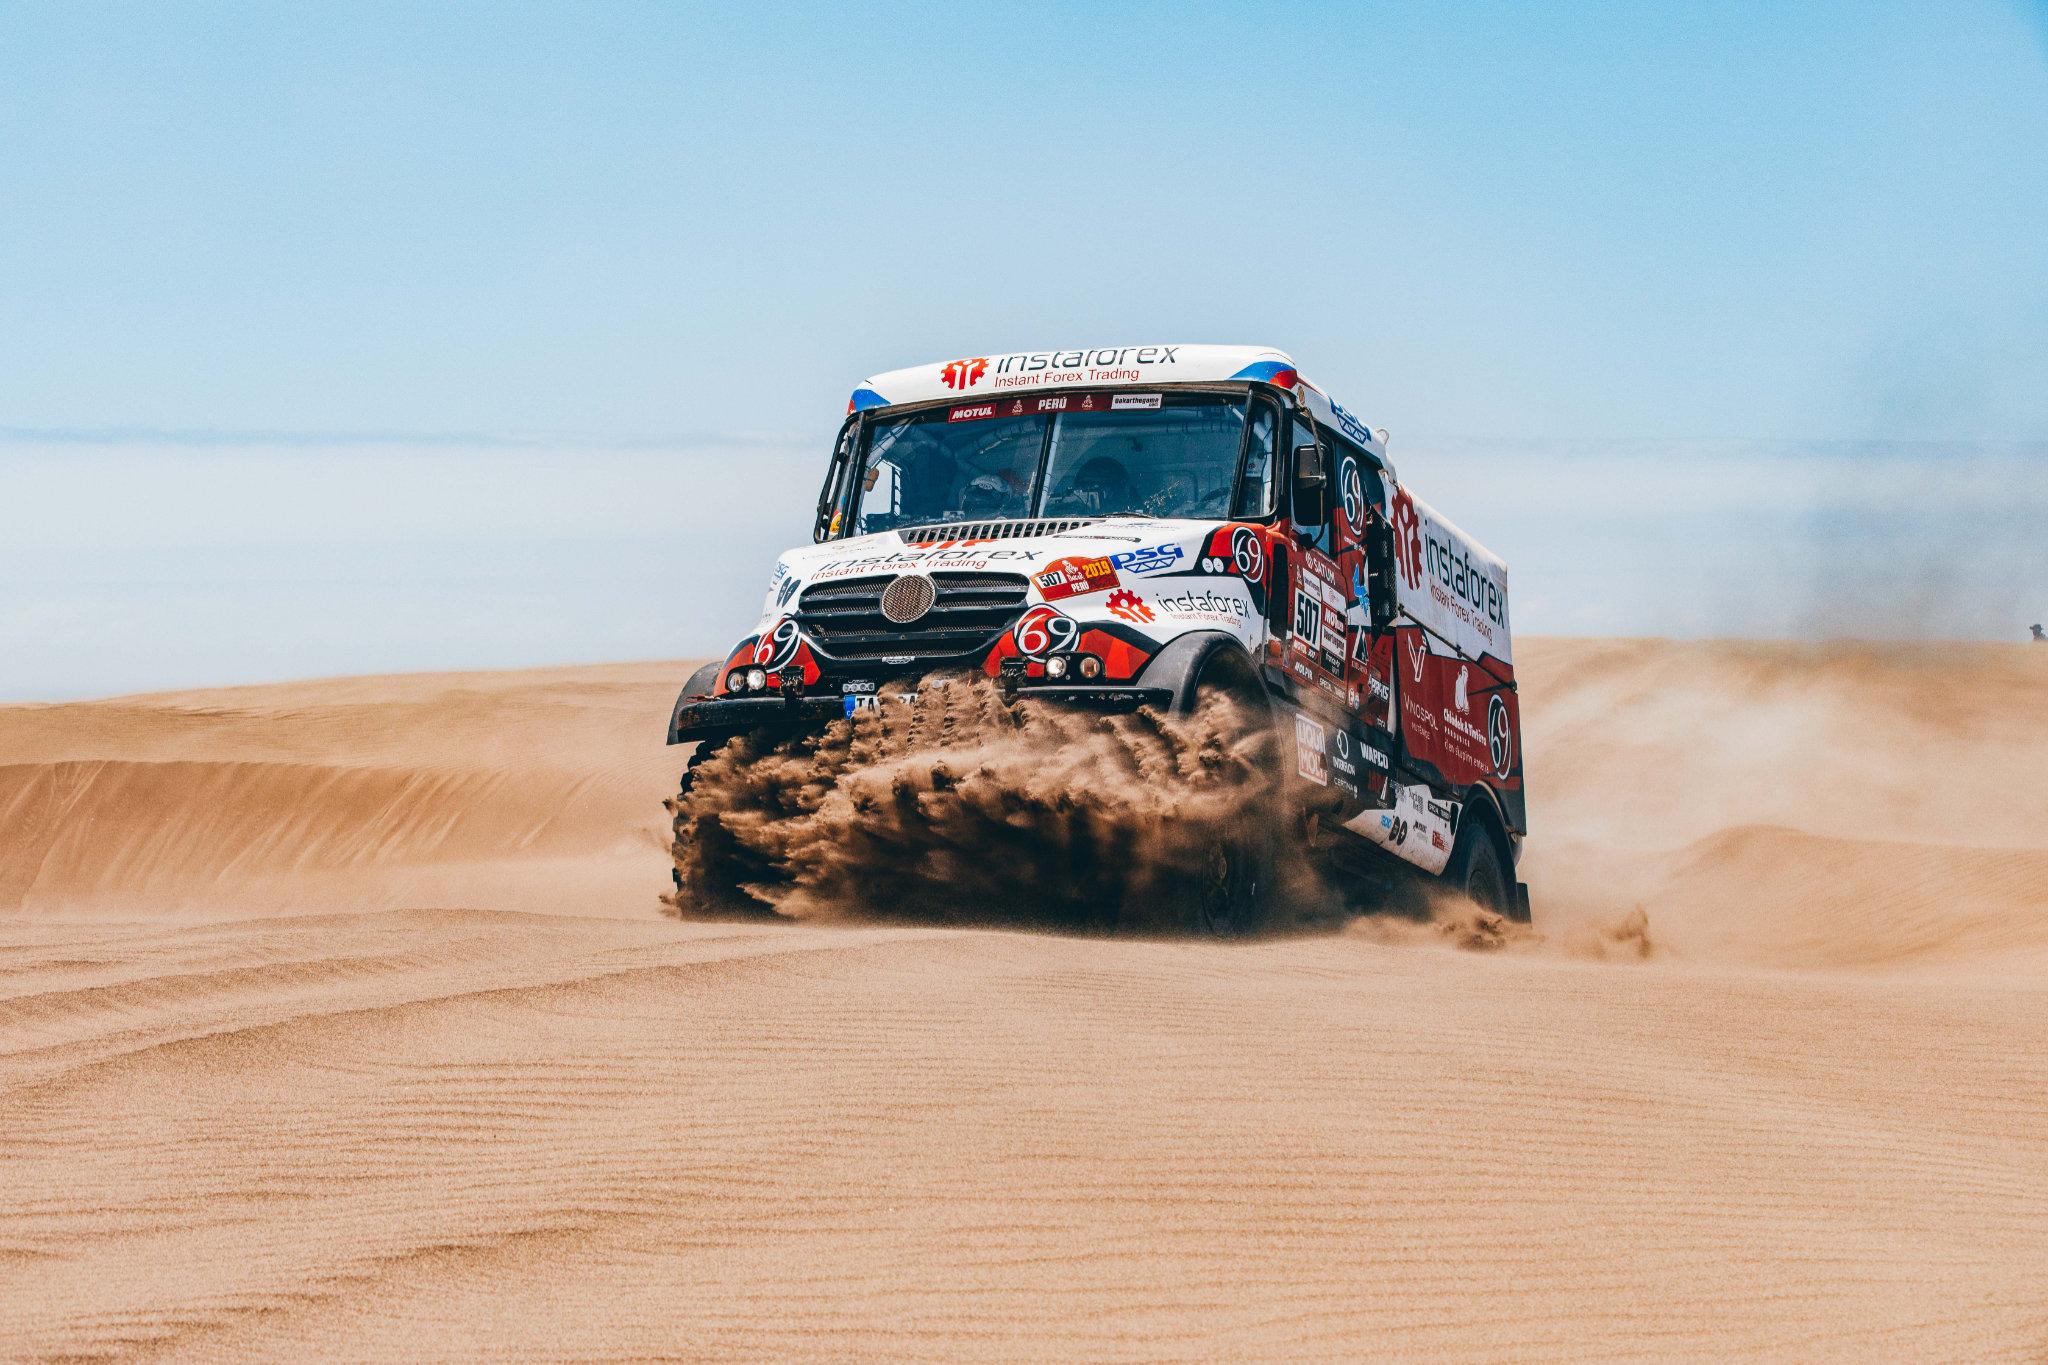 Aleš Loprais, Dakar 2019